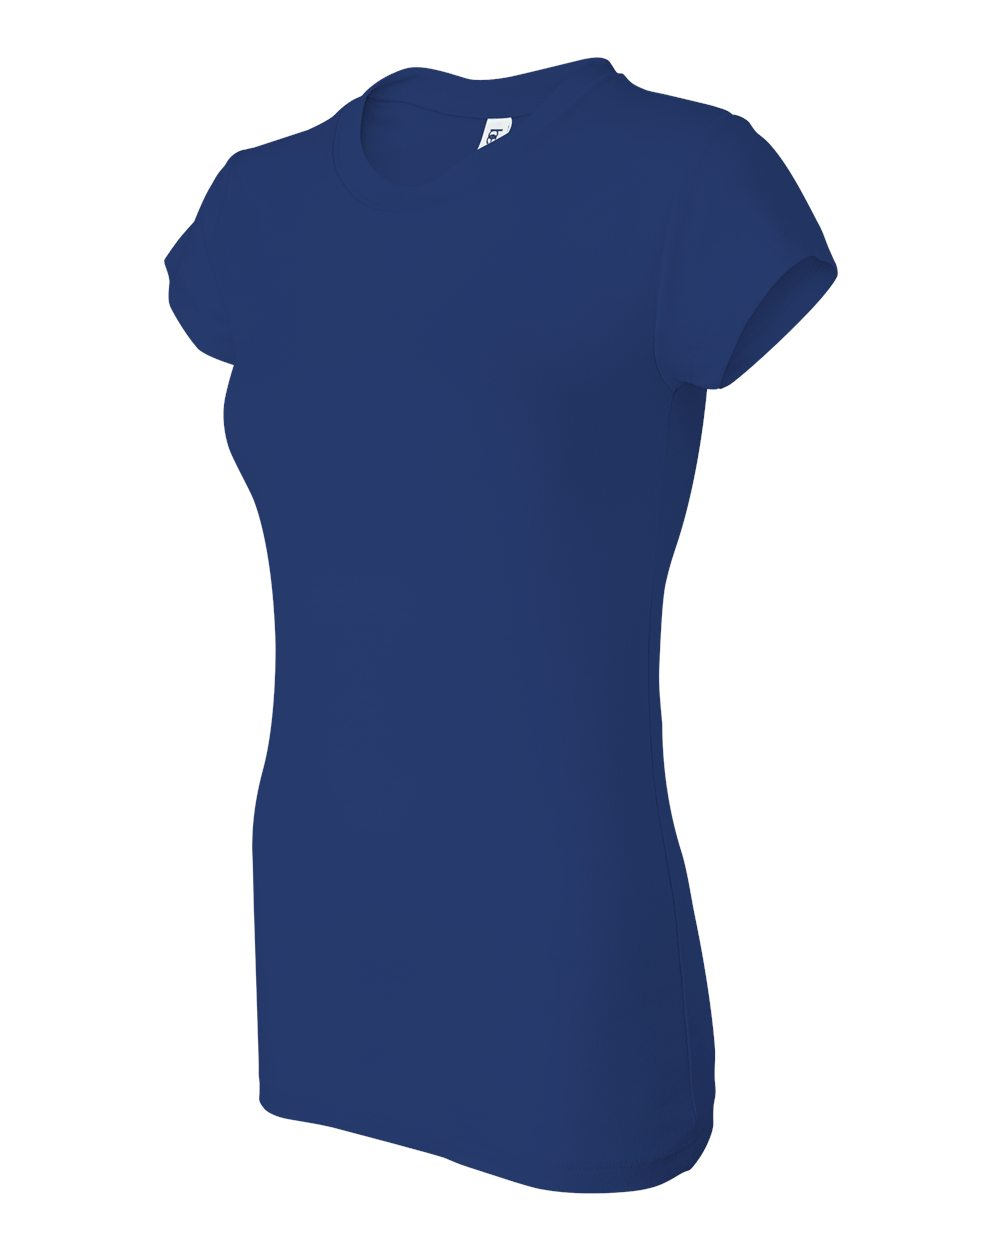 Bella-Canvas-Women-039-s-Sheer-Mini-Rib-Short-Sleeve-T-Shirt-8701-S-2XL thumbnail 33